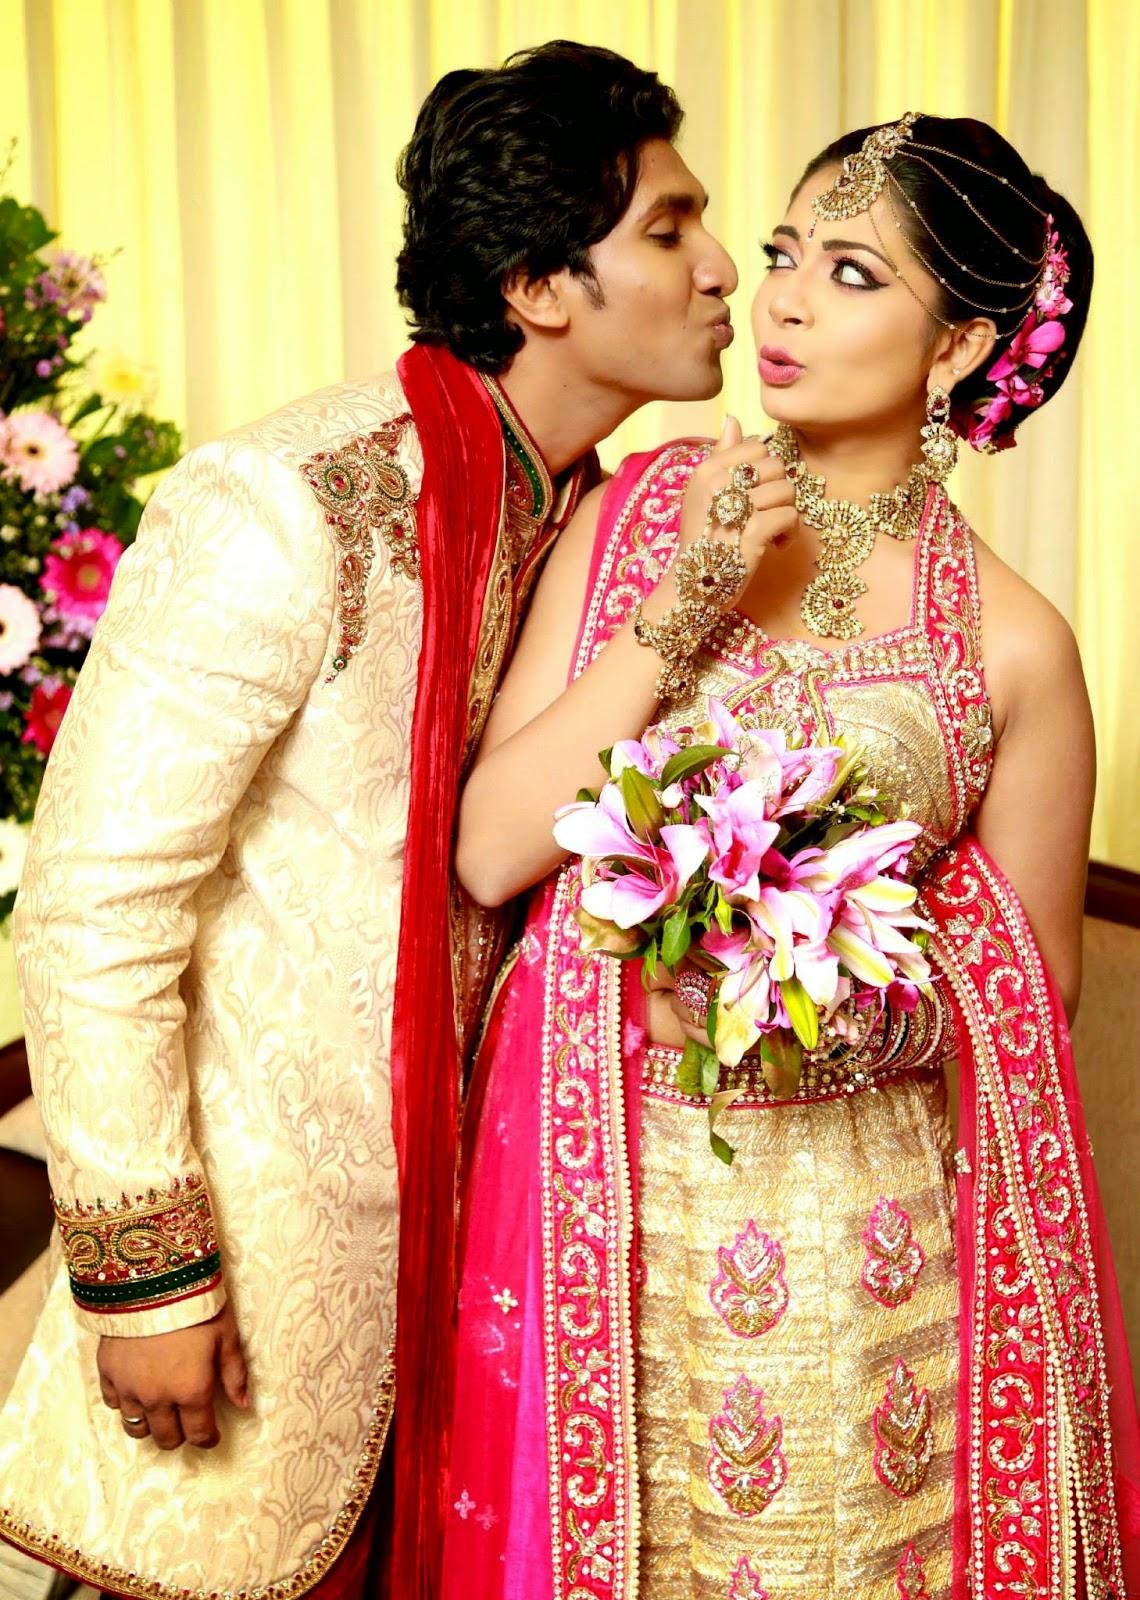 Udari Kaushalya and Sangeeth love